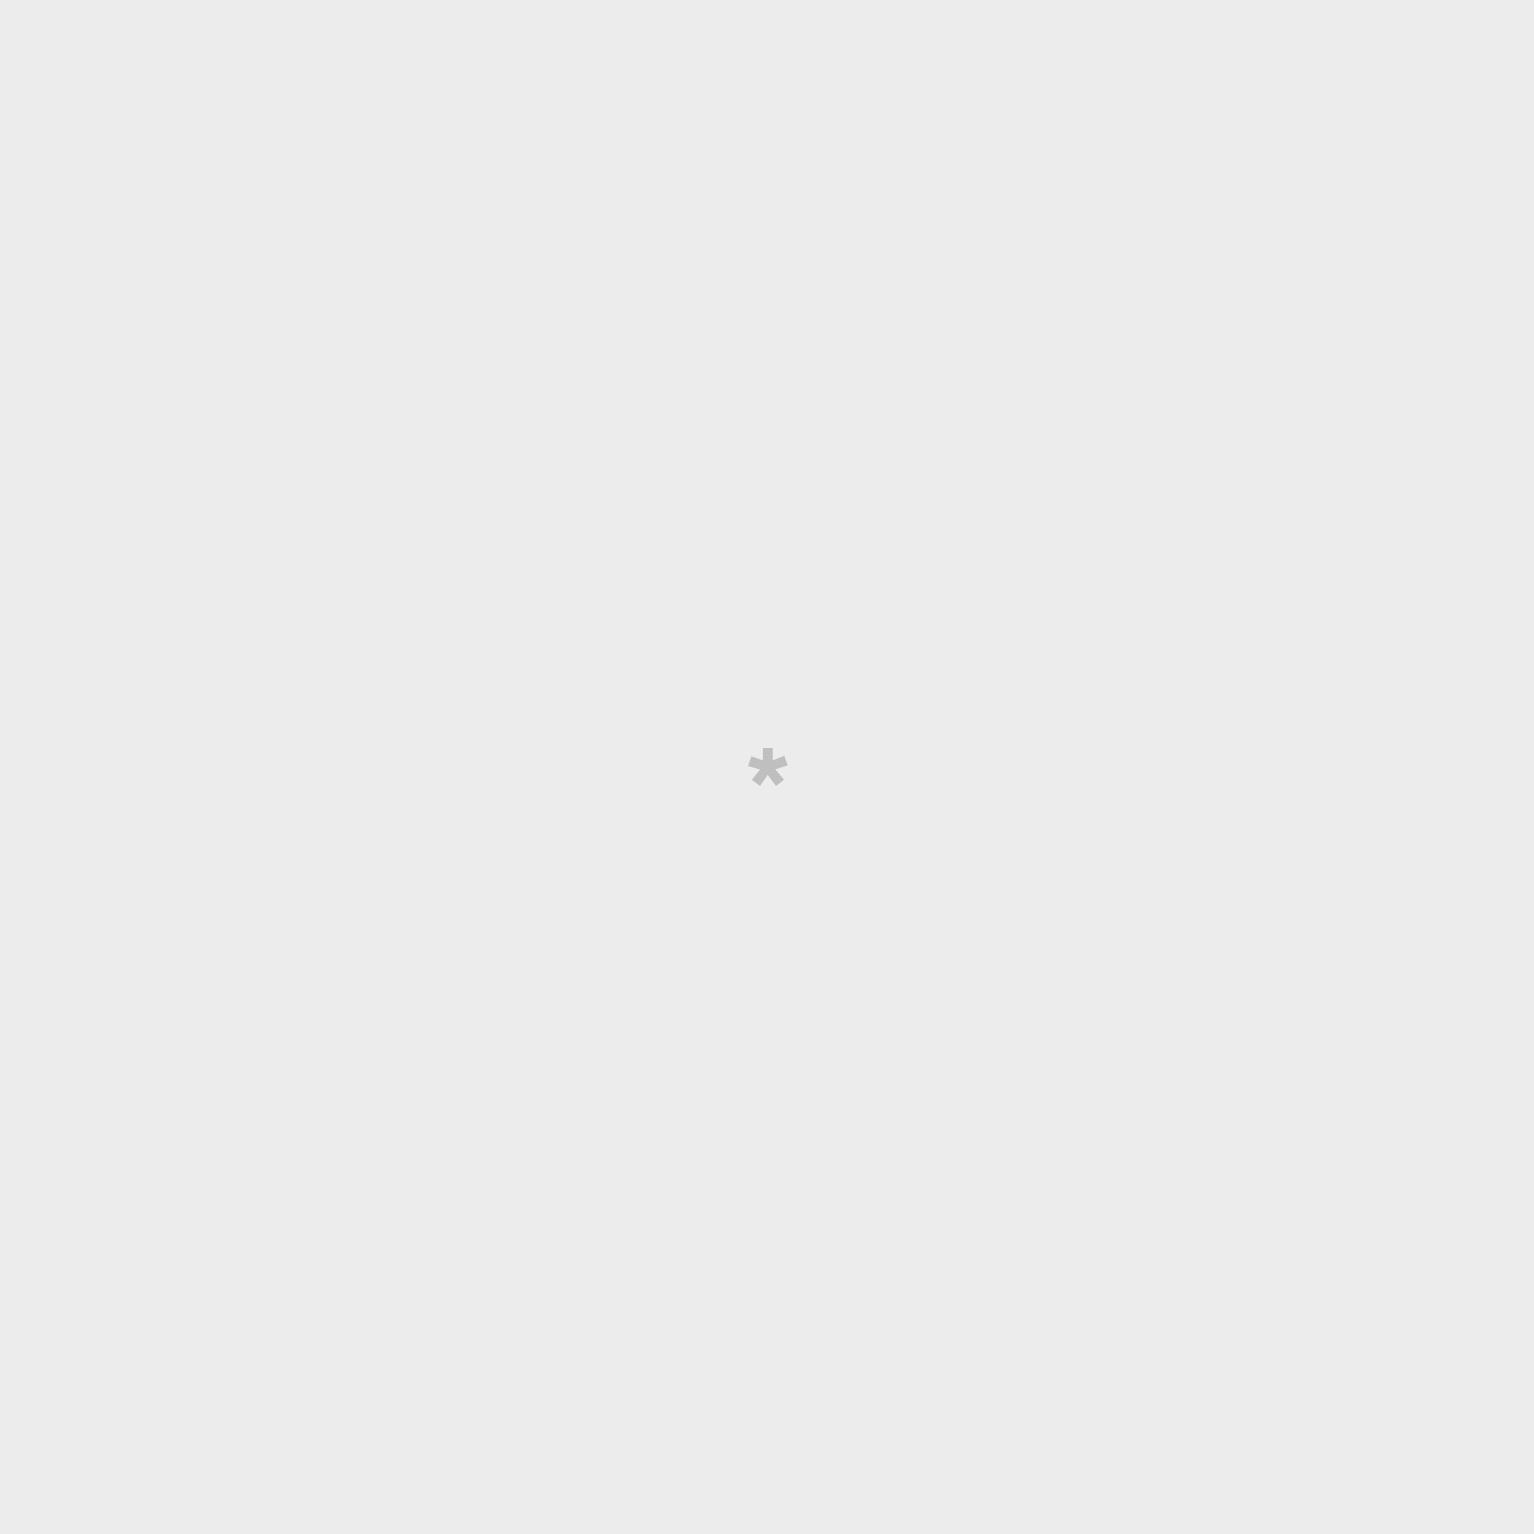 Laptop backpack - Downloading Wonderful things